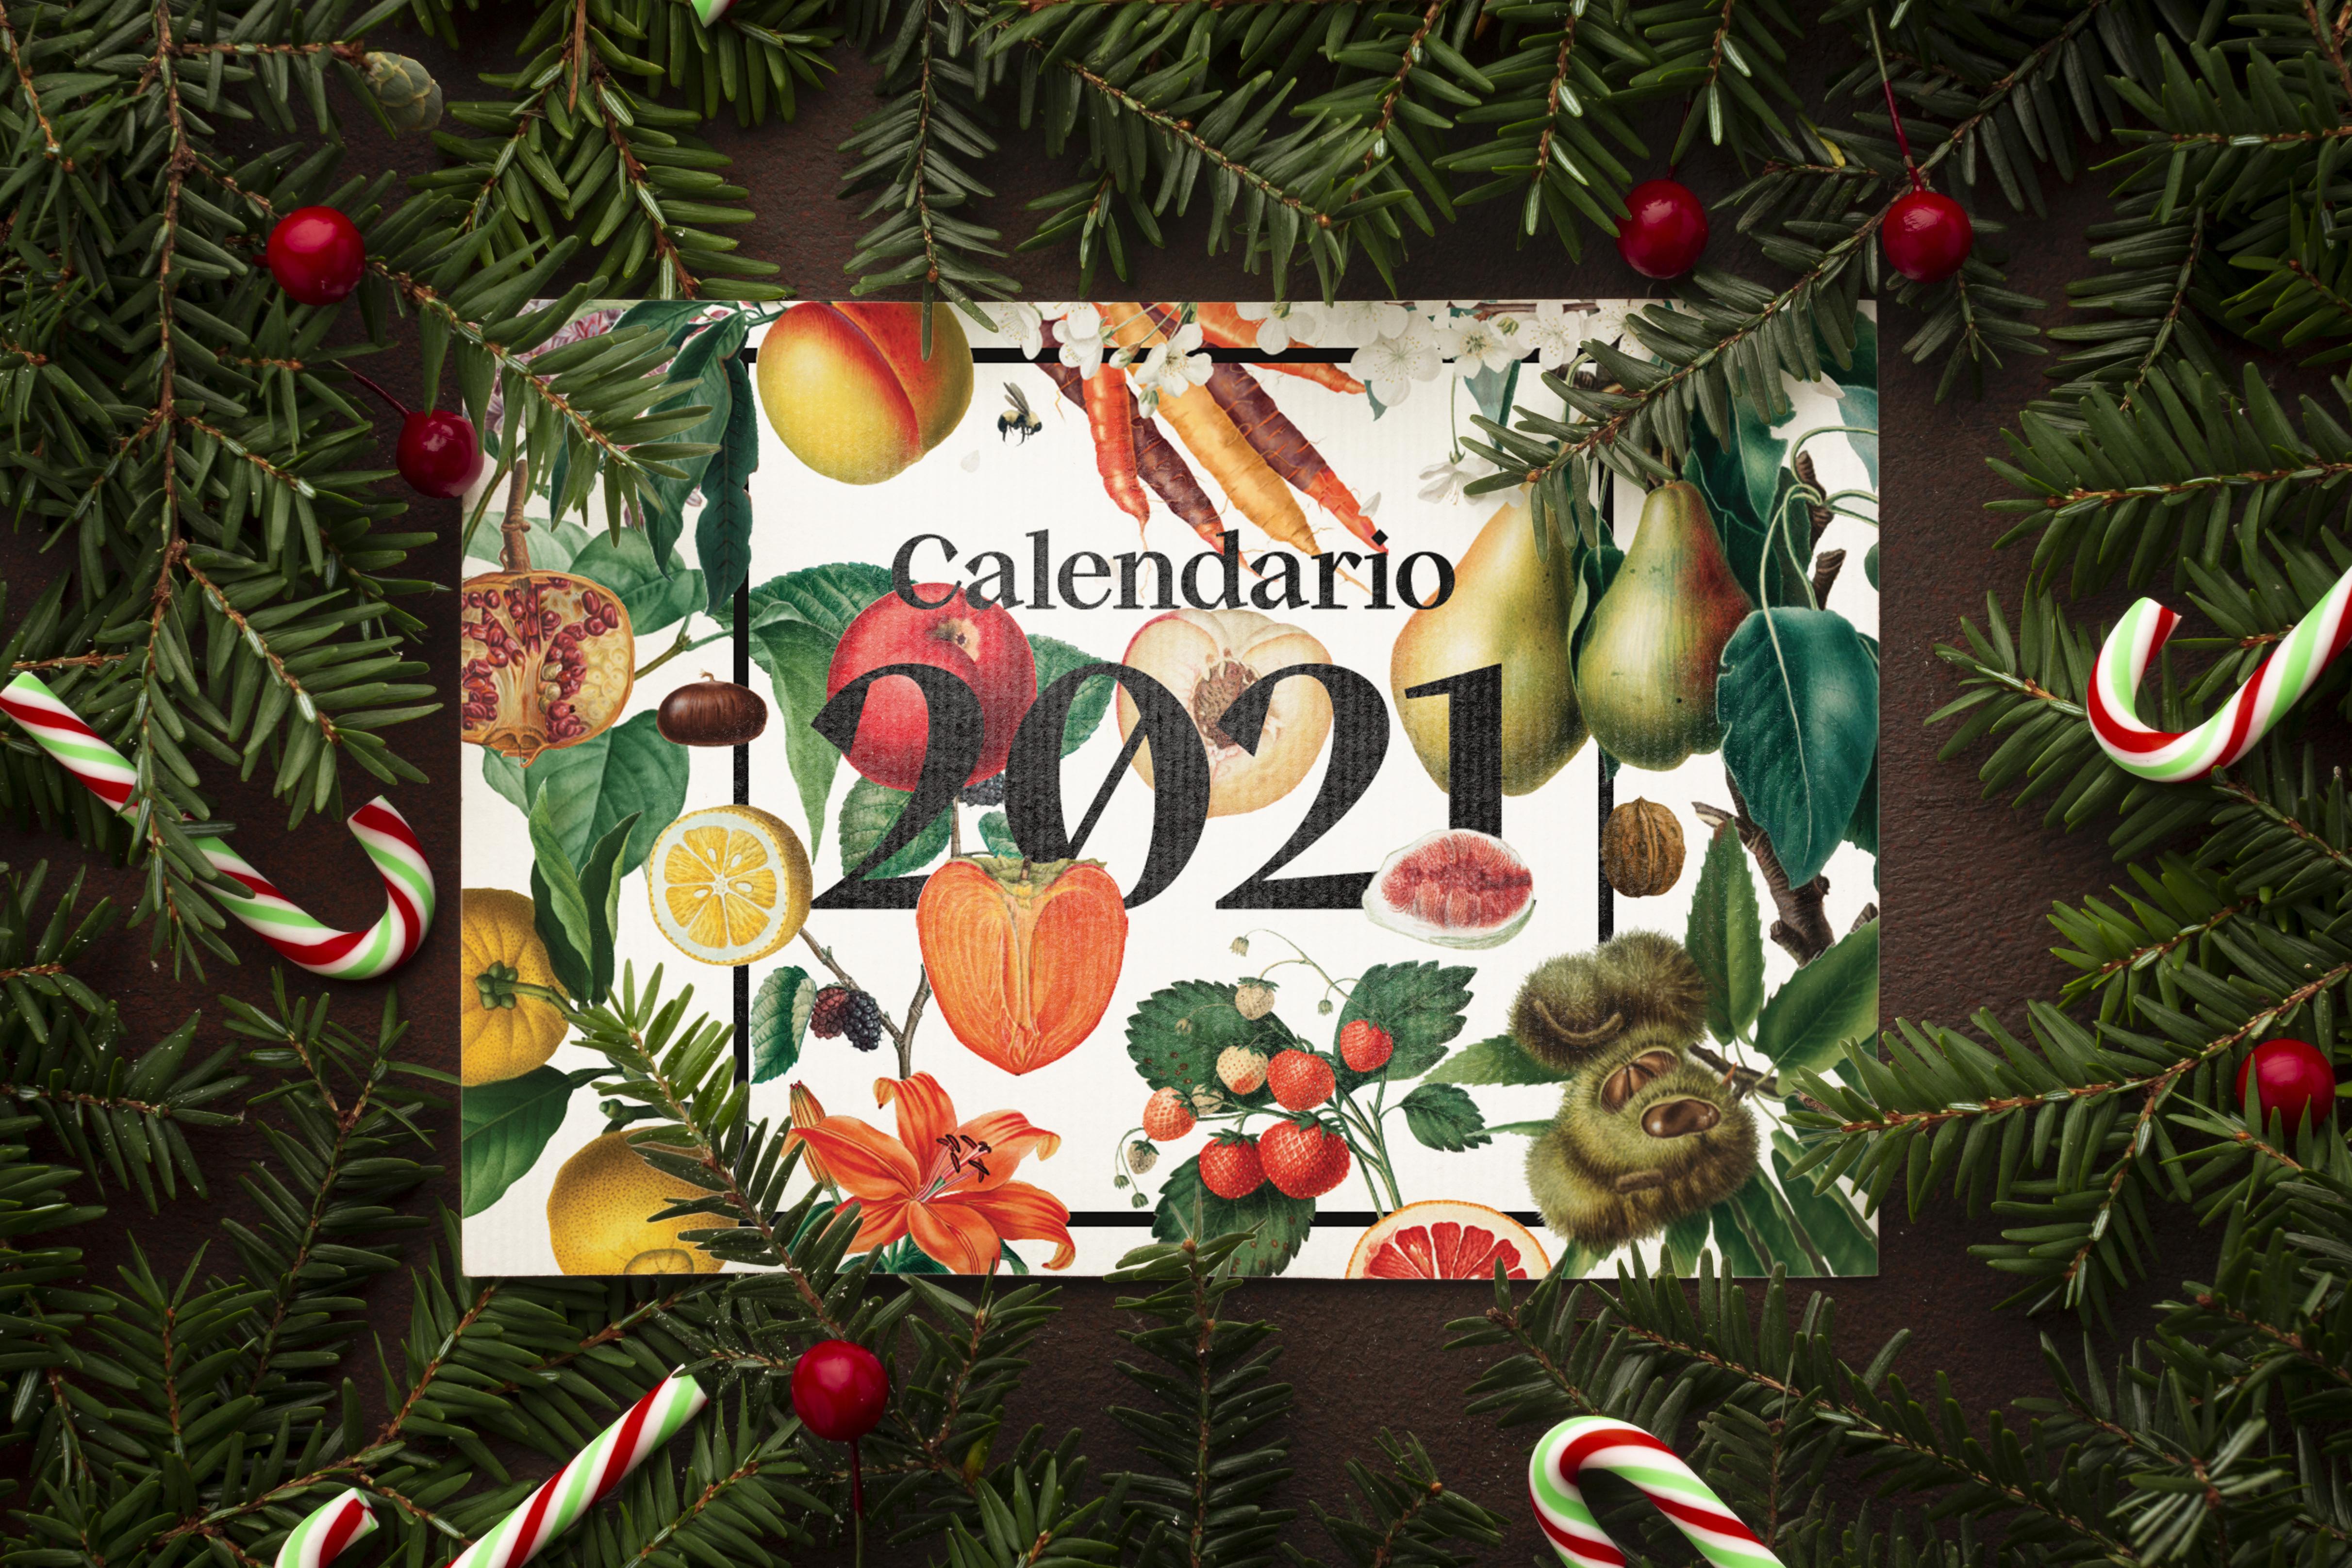 Natale 2021 Calendario.Calendario Botanico Illustrato 2021 Garage Comunicazione